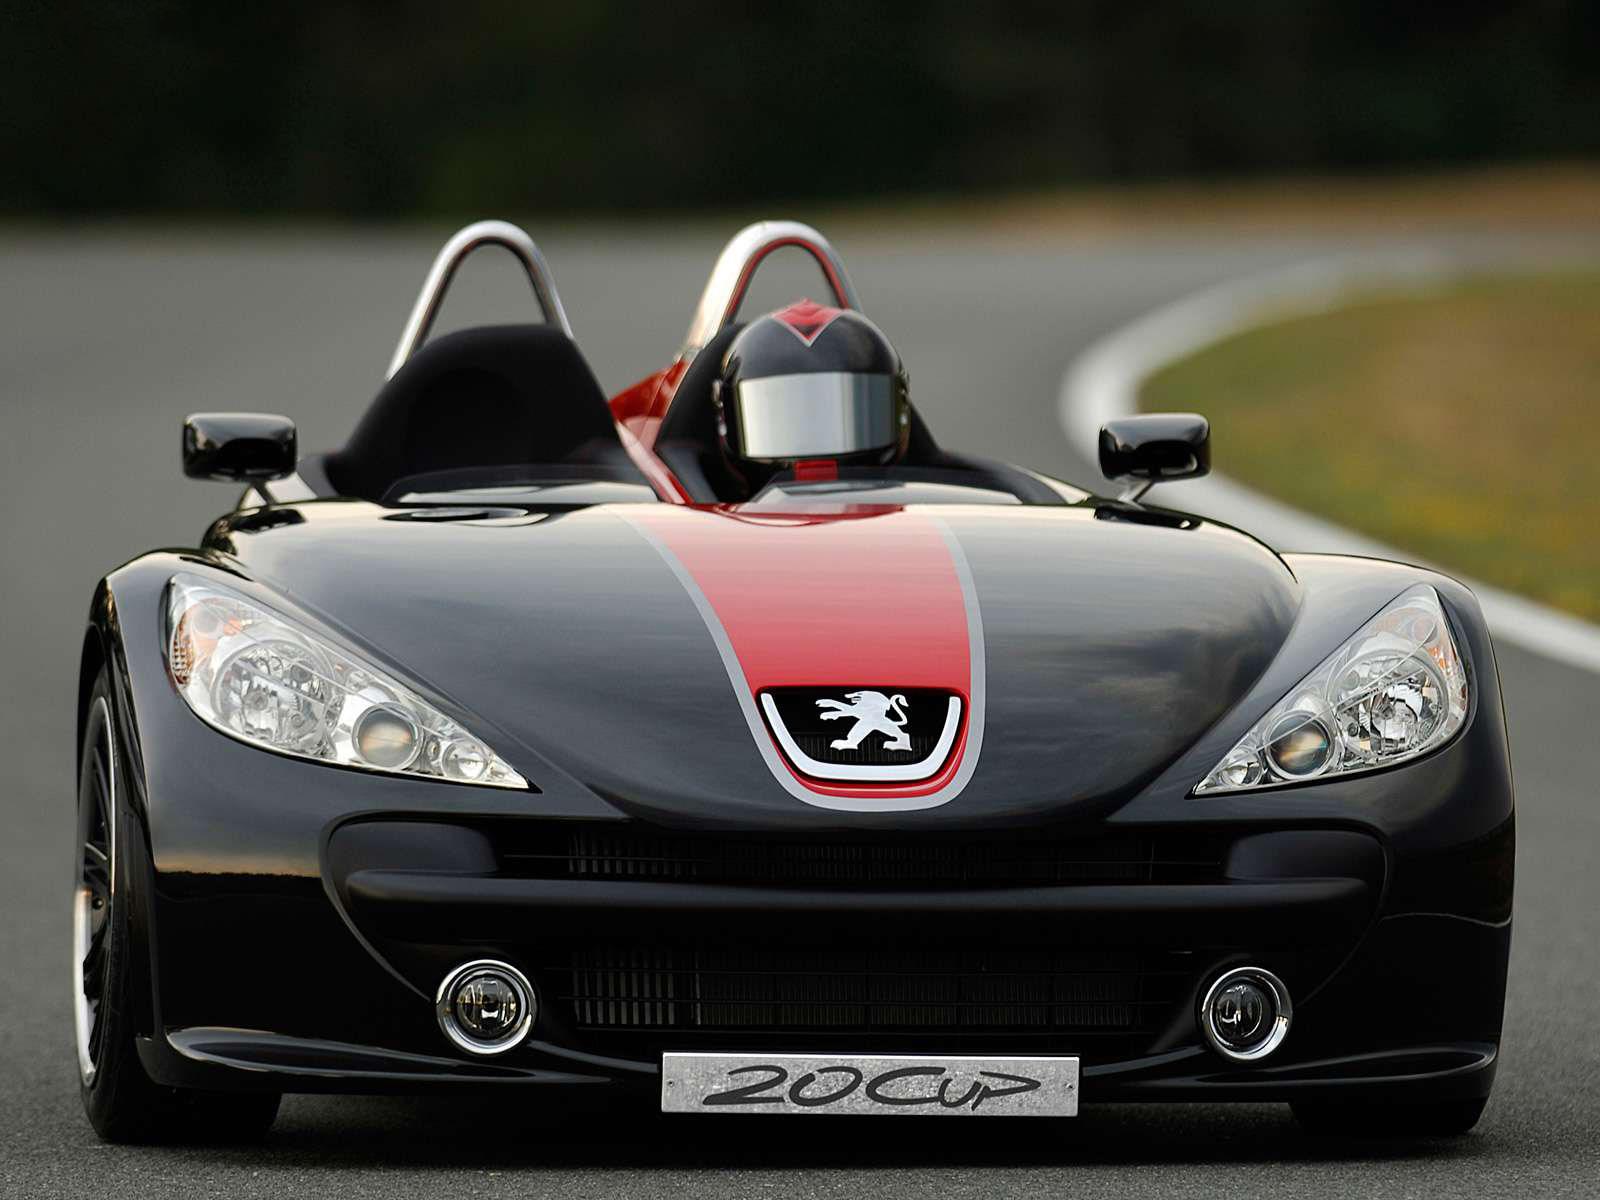 http://2.bp.blogspot.com/_DEP49tusZwg/TJ6cjndX-aI/AAAAAAAABZs/TaAemNtt0rE/s1600/Peugeot_20Cup_Concept_2006_2.jpg